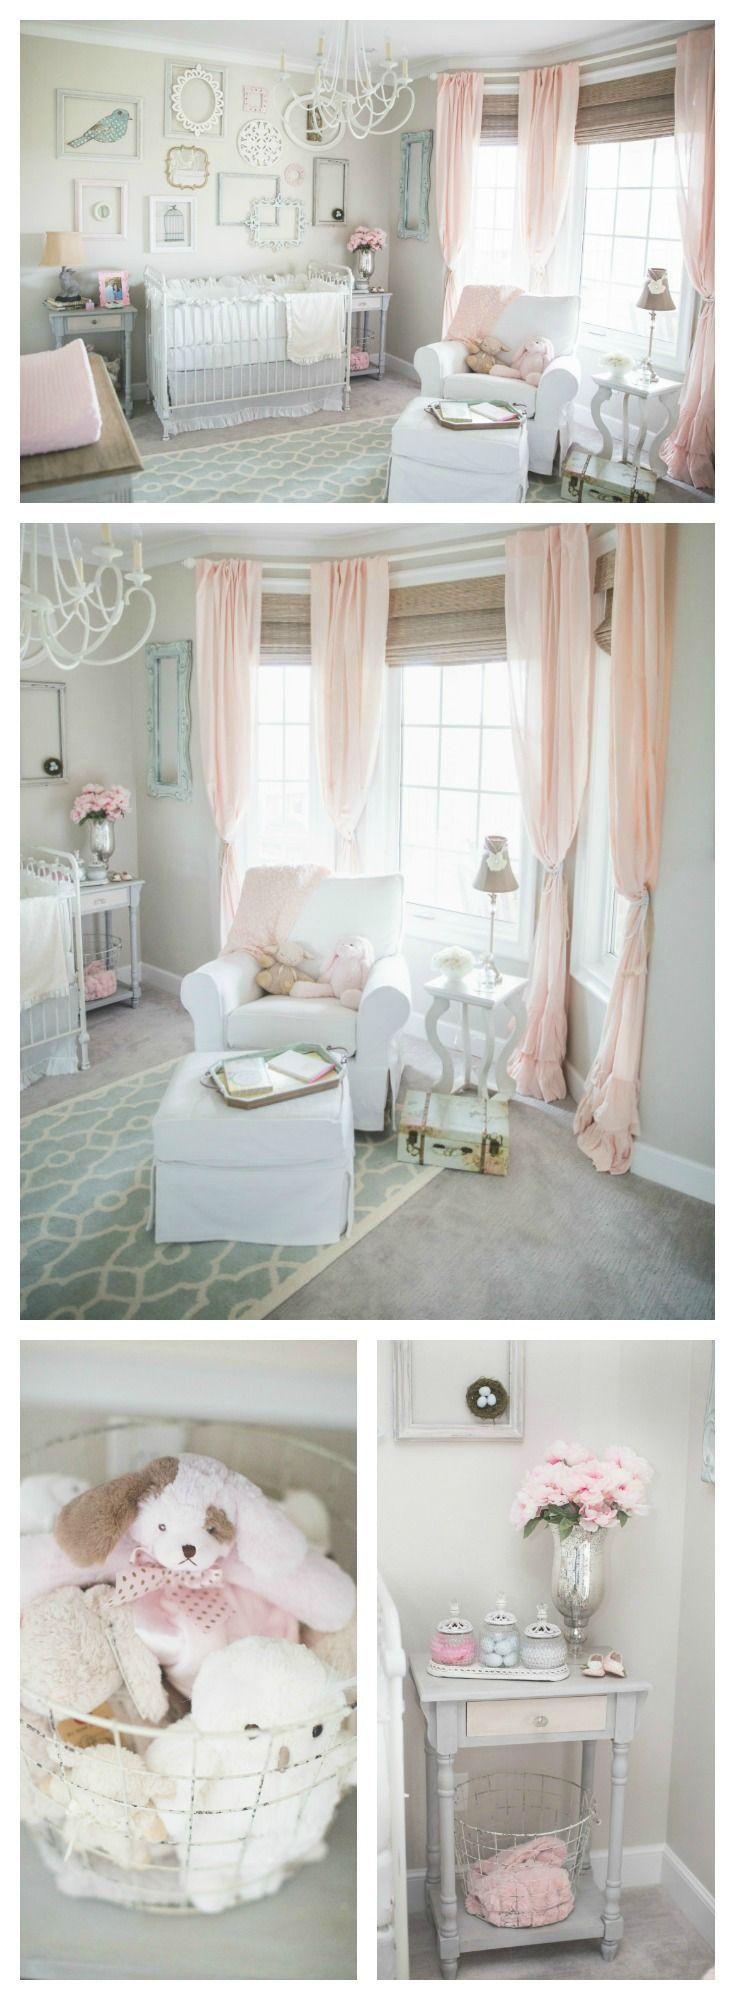 Dainty Soft and Sweet Nursery